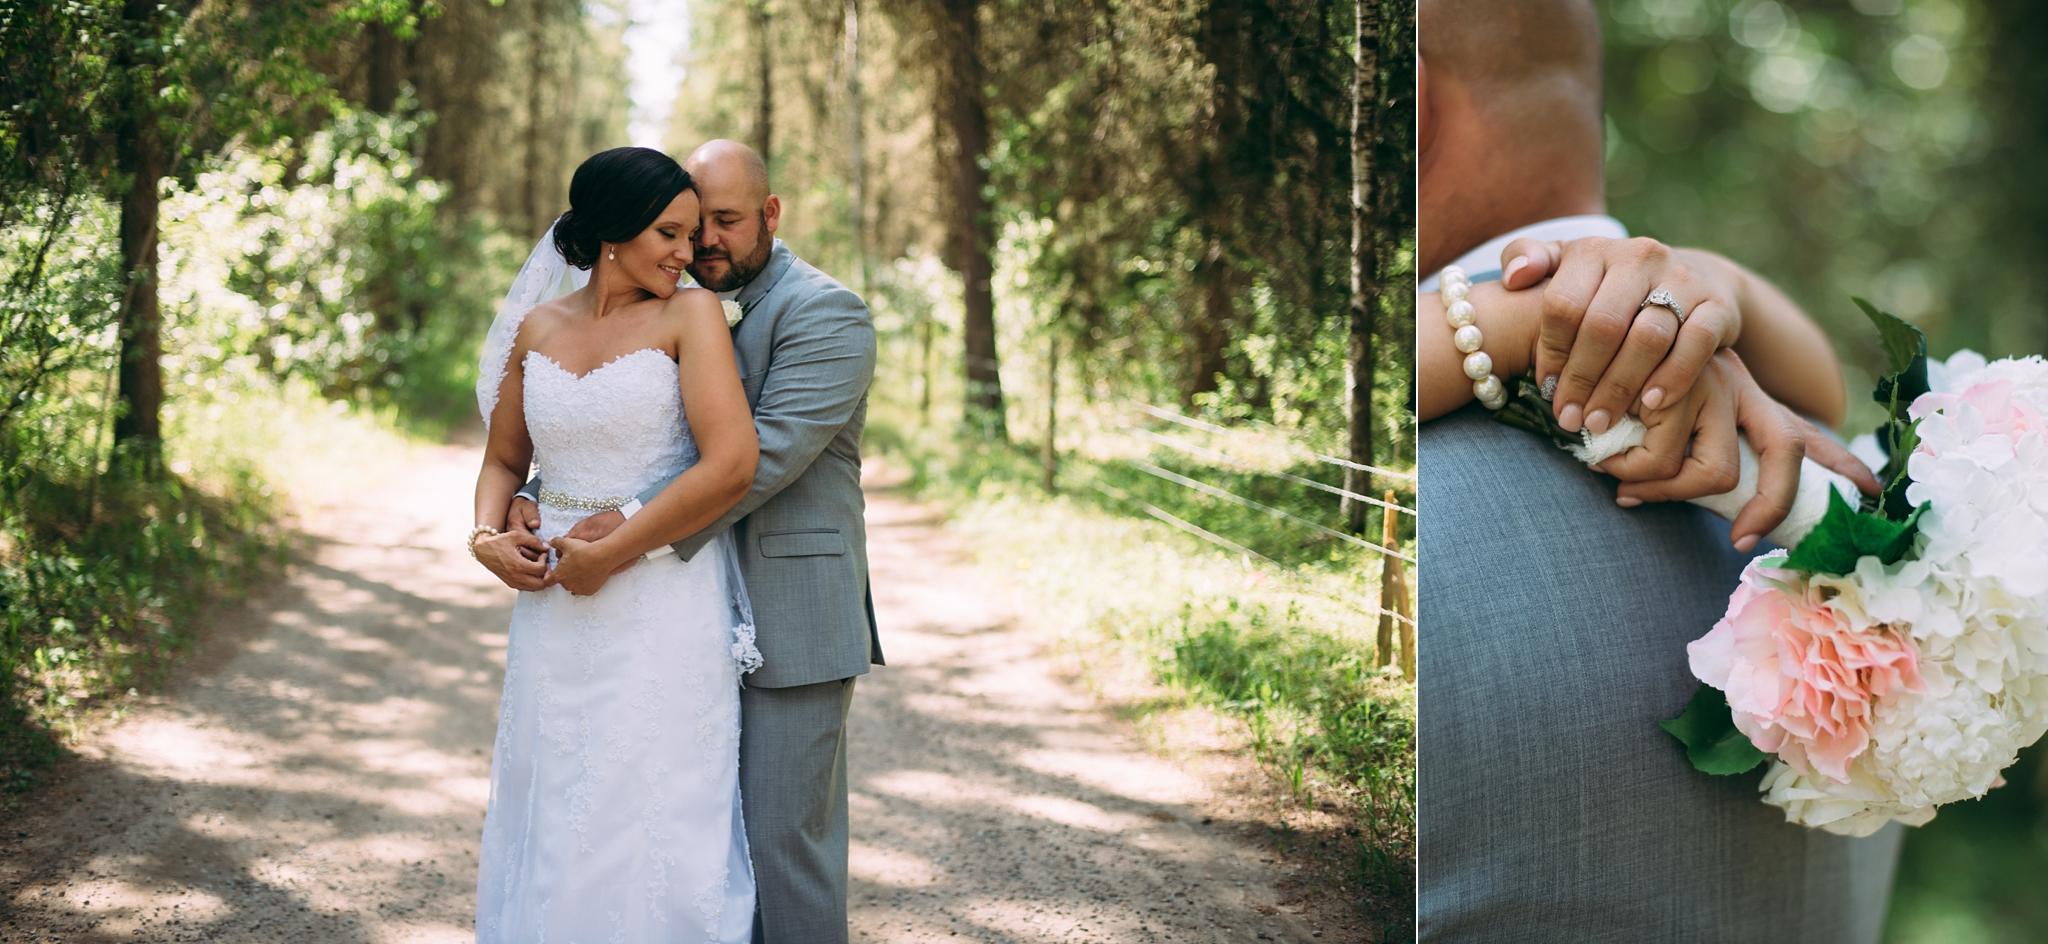 kaihla_tonai_intimate_wedding_elopement_photographer_1542